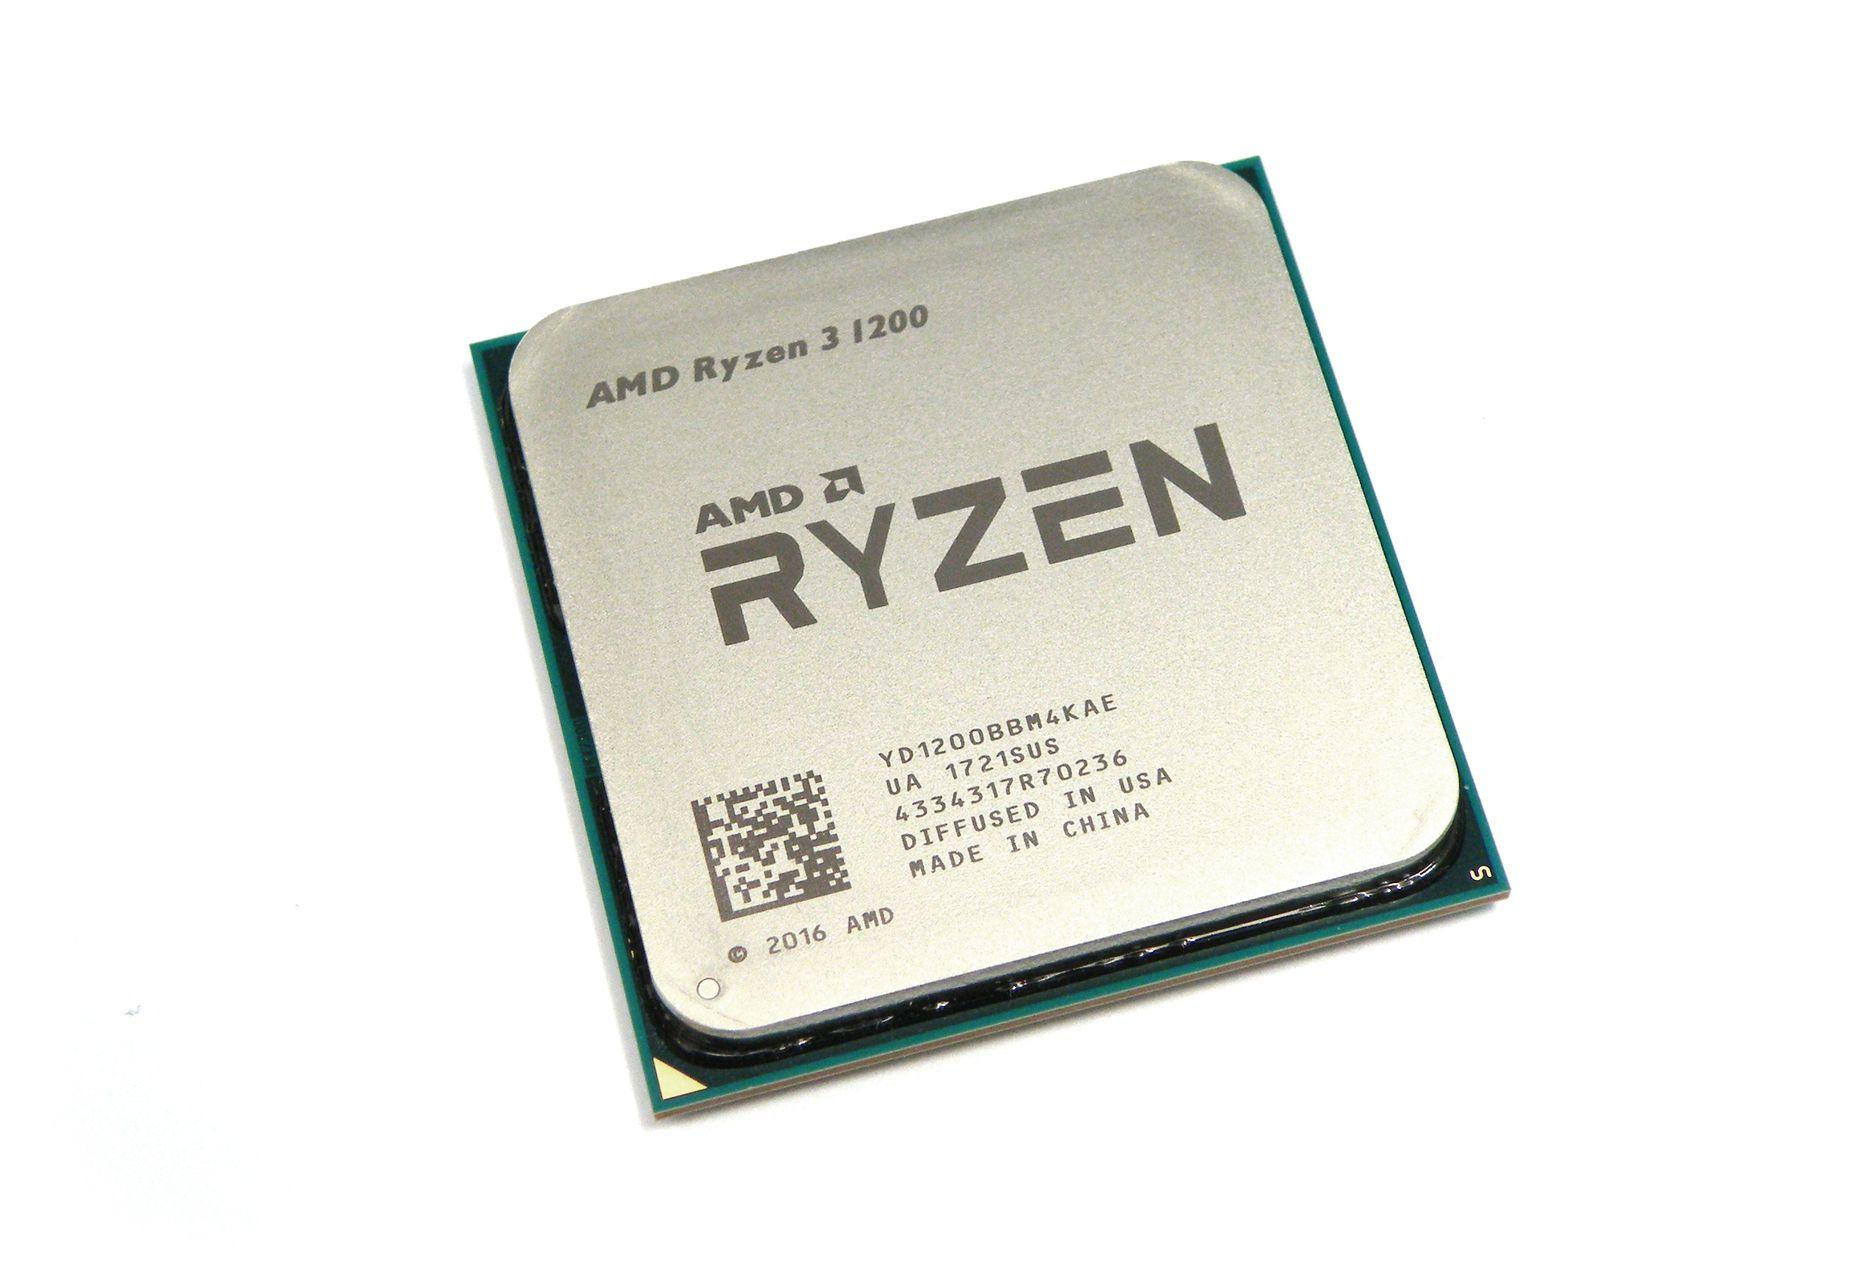 AMD Ryzen 3 1200 procesor